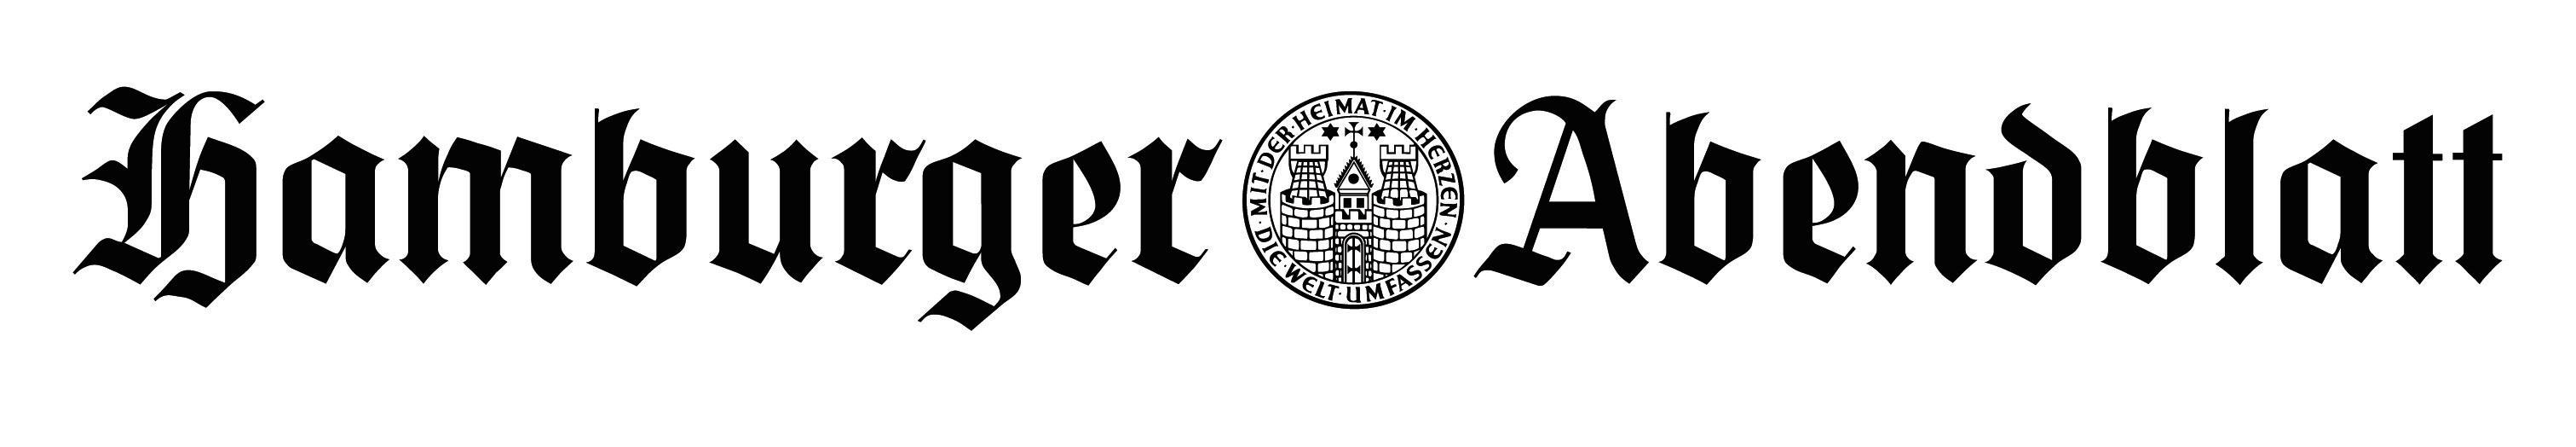 Hamburger Abendblatt Kreuzwort